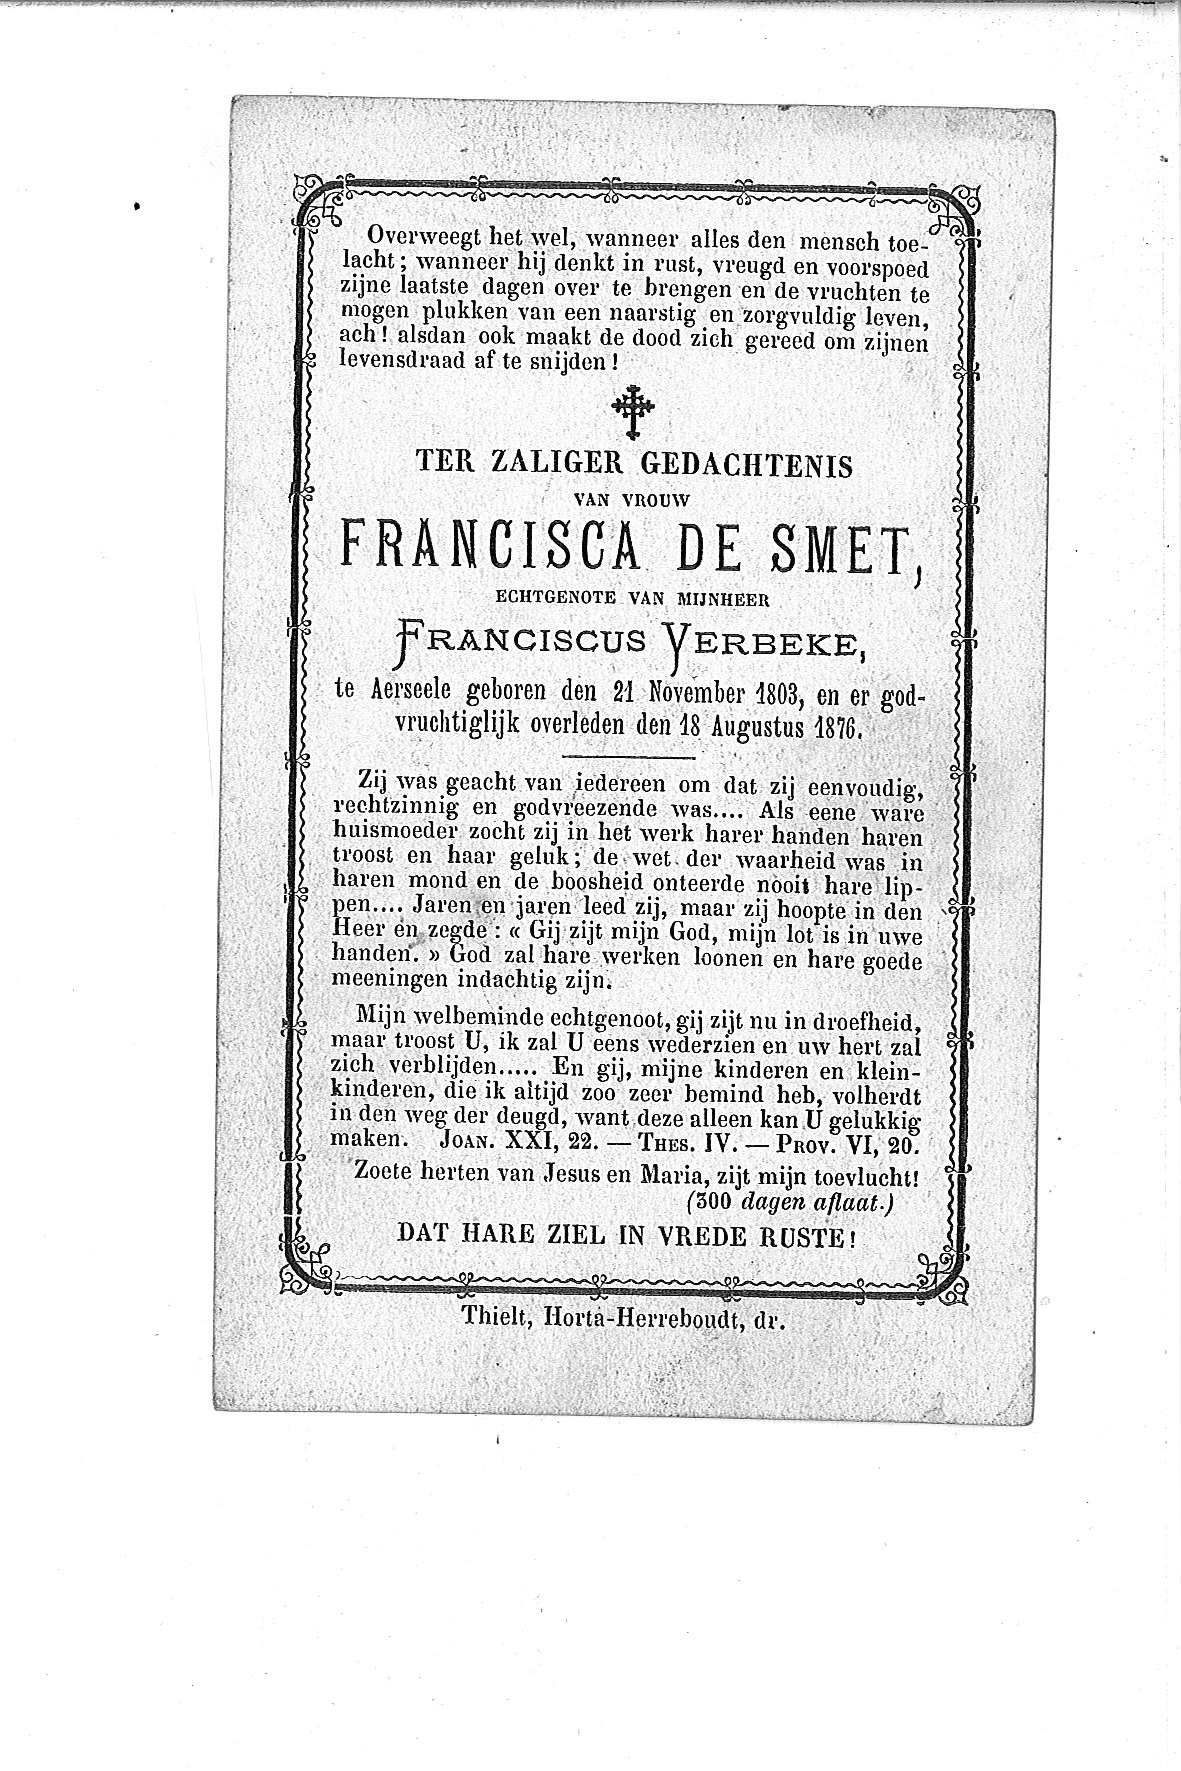 Francisca (1876) 20120507093410_00066.jpg